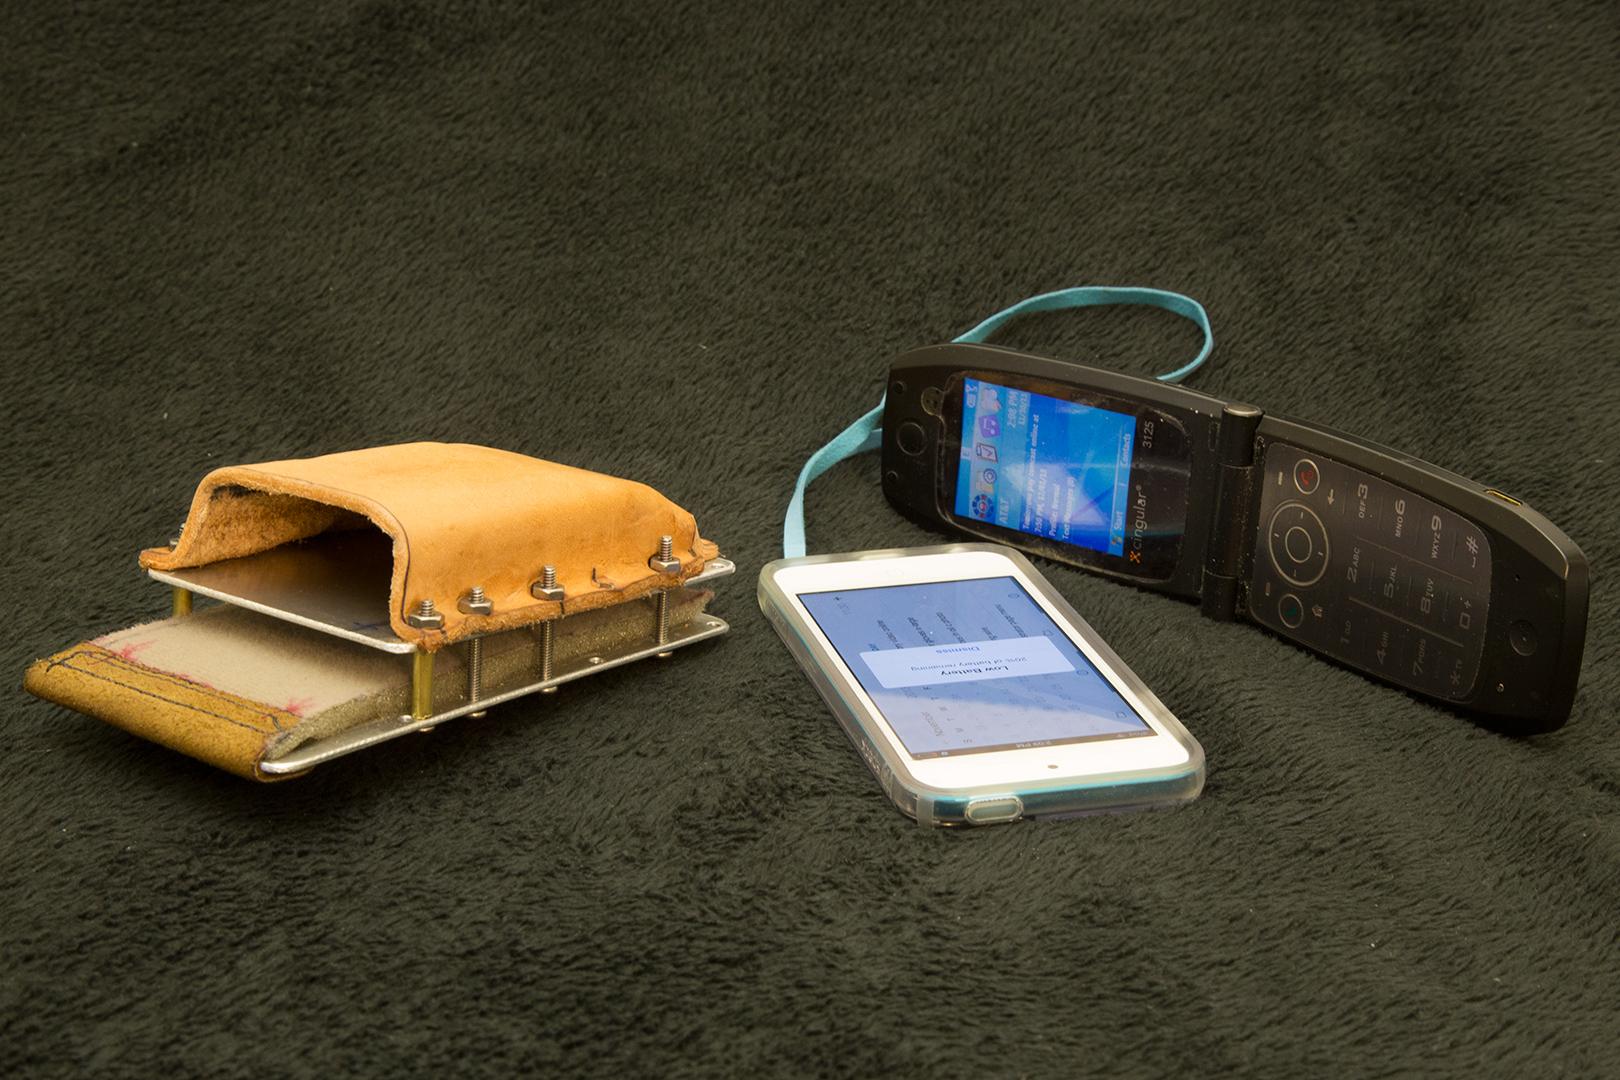 sale retailer 30d9a d8299 Handmade dumbphone and wifi phone case tutorial